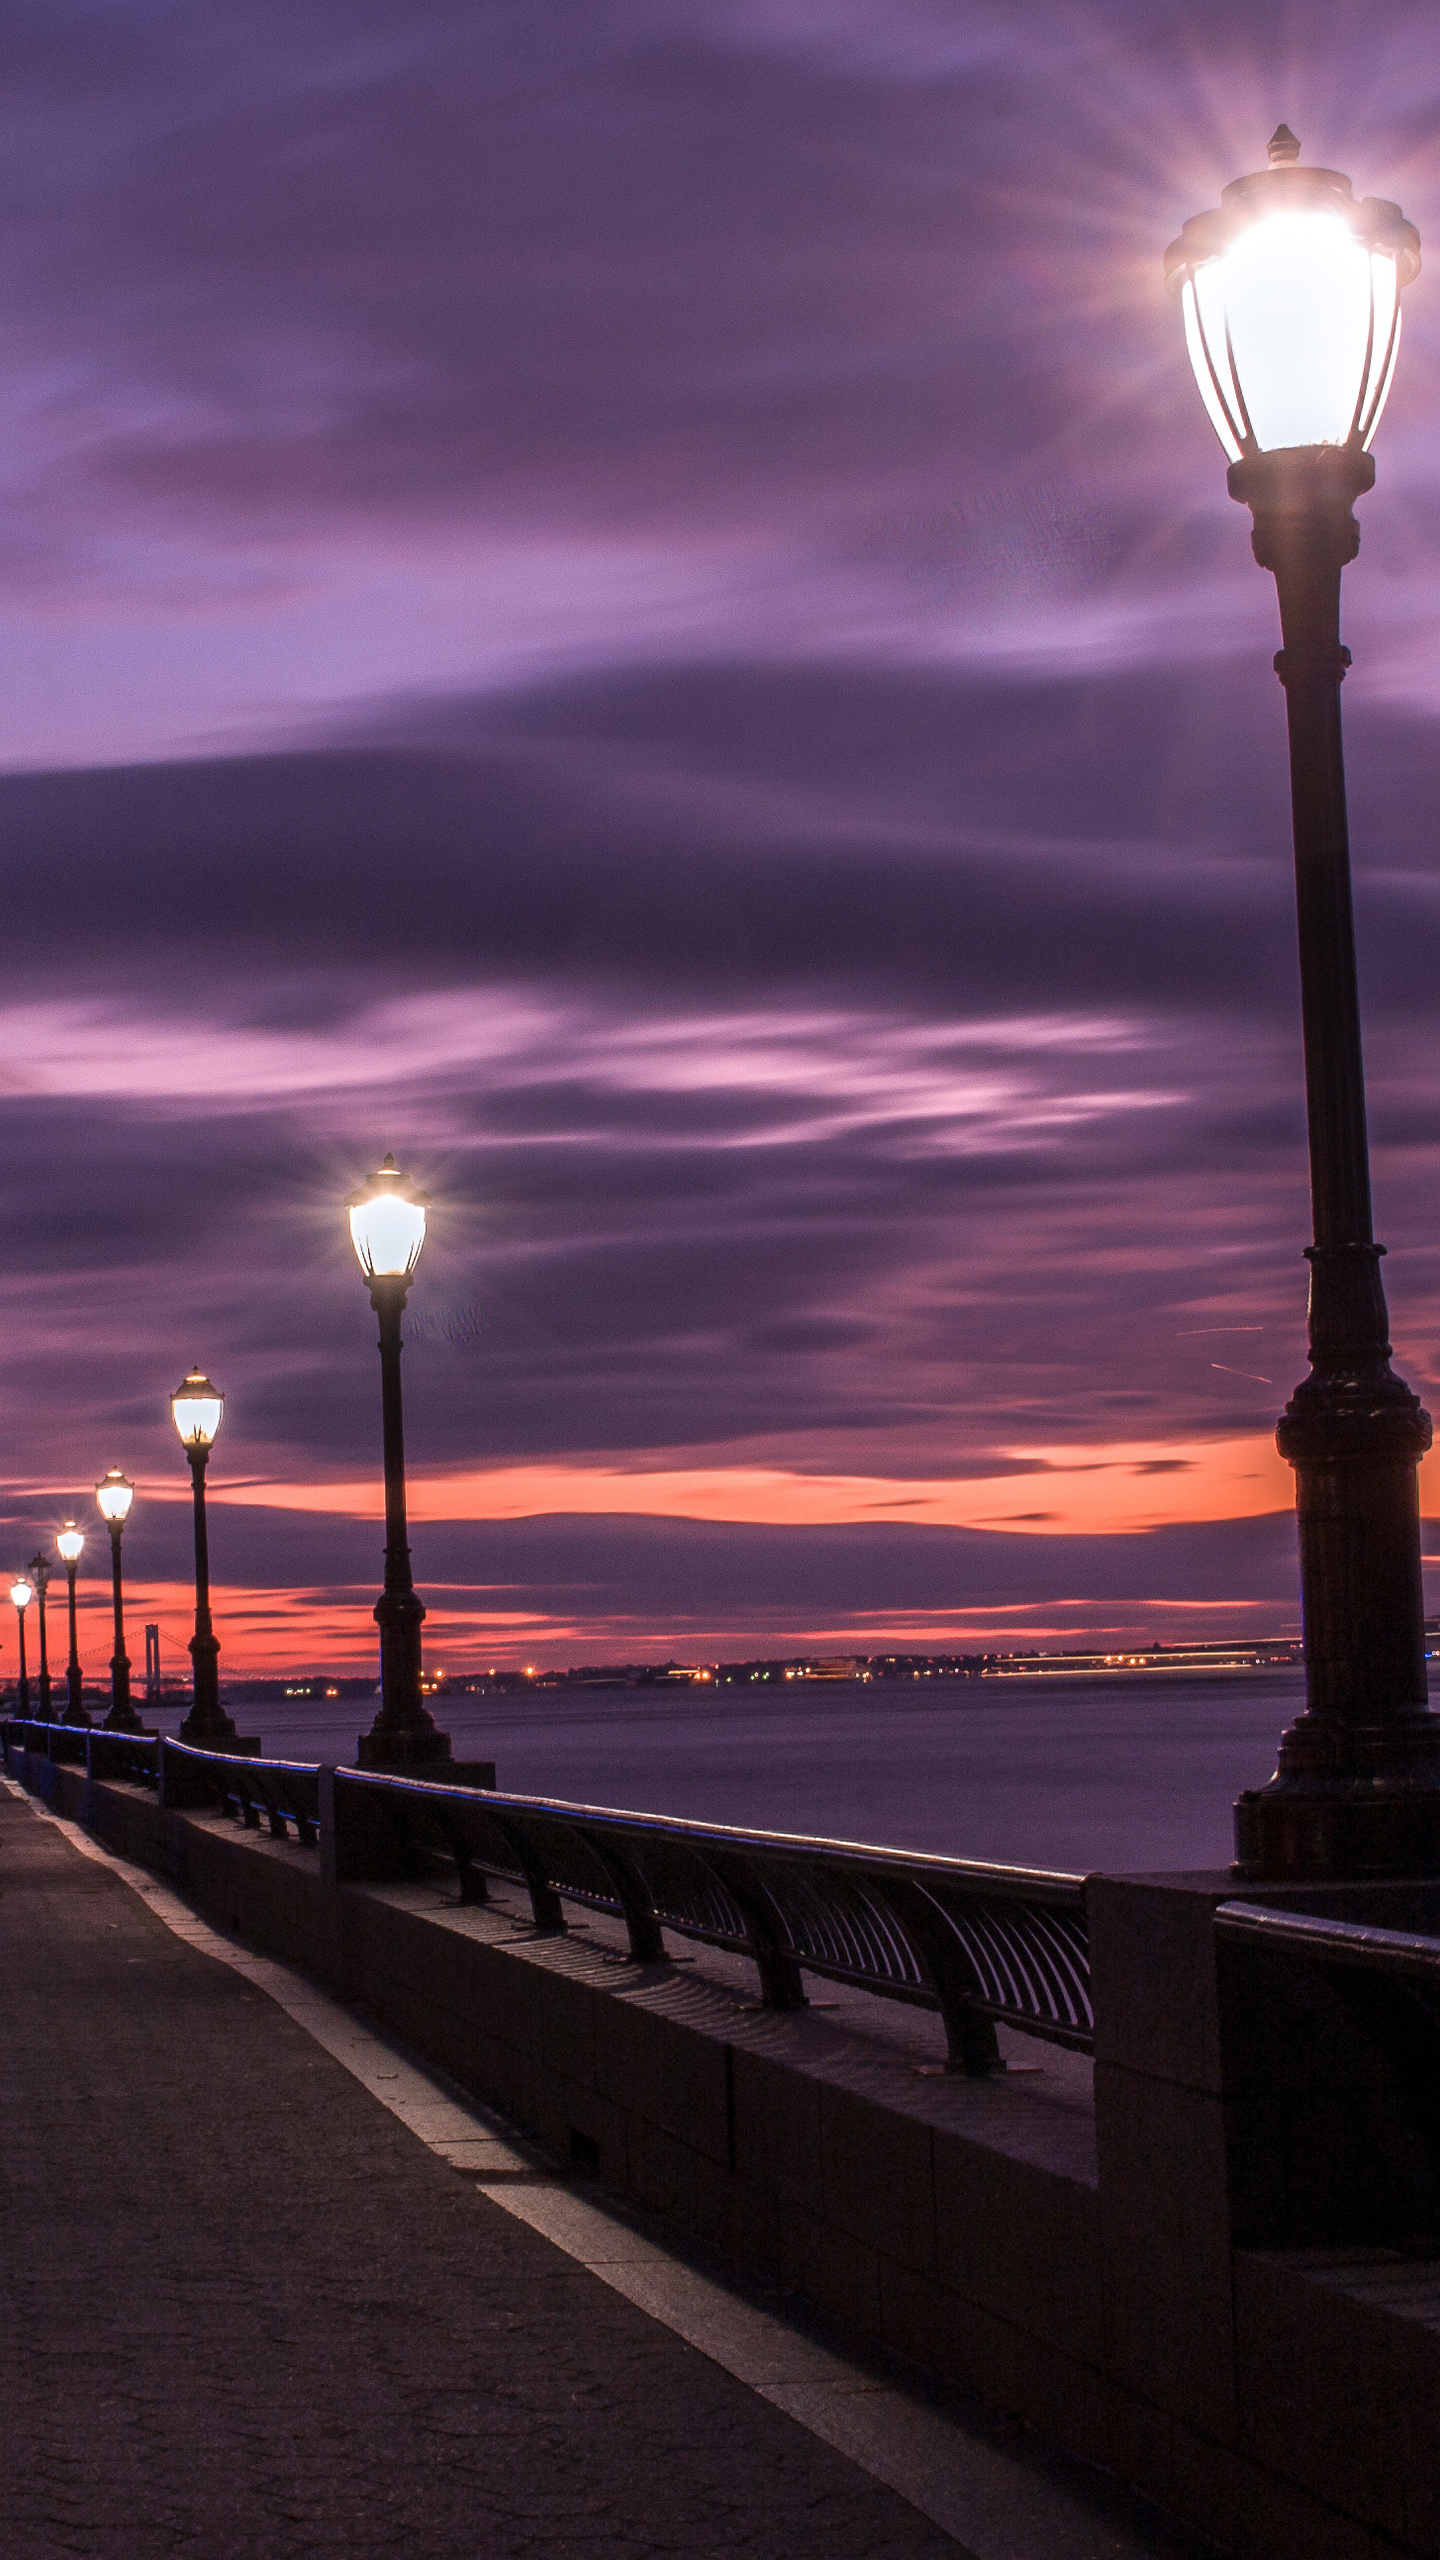 evening-street-lamp-beside-bay-4k-c1.jpg